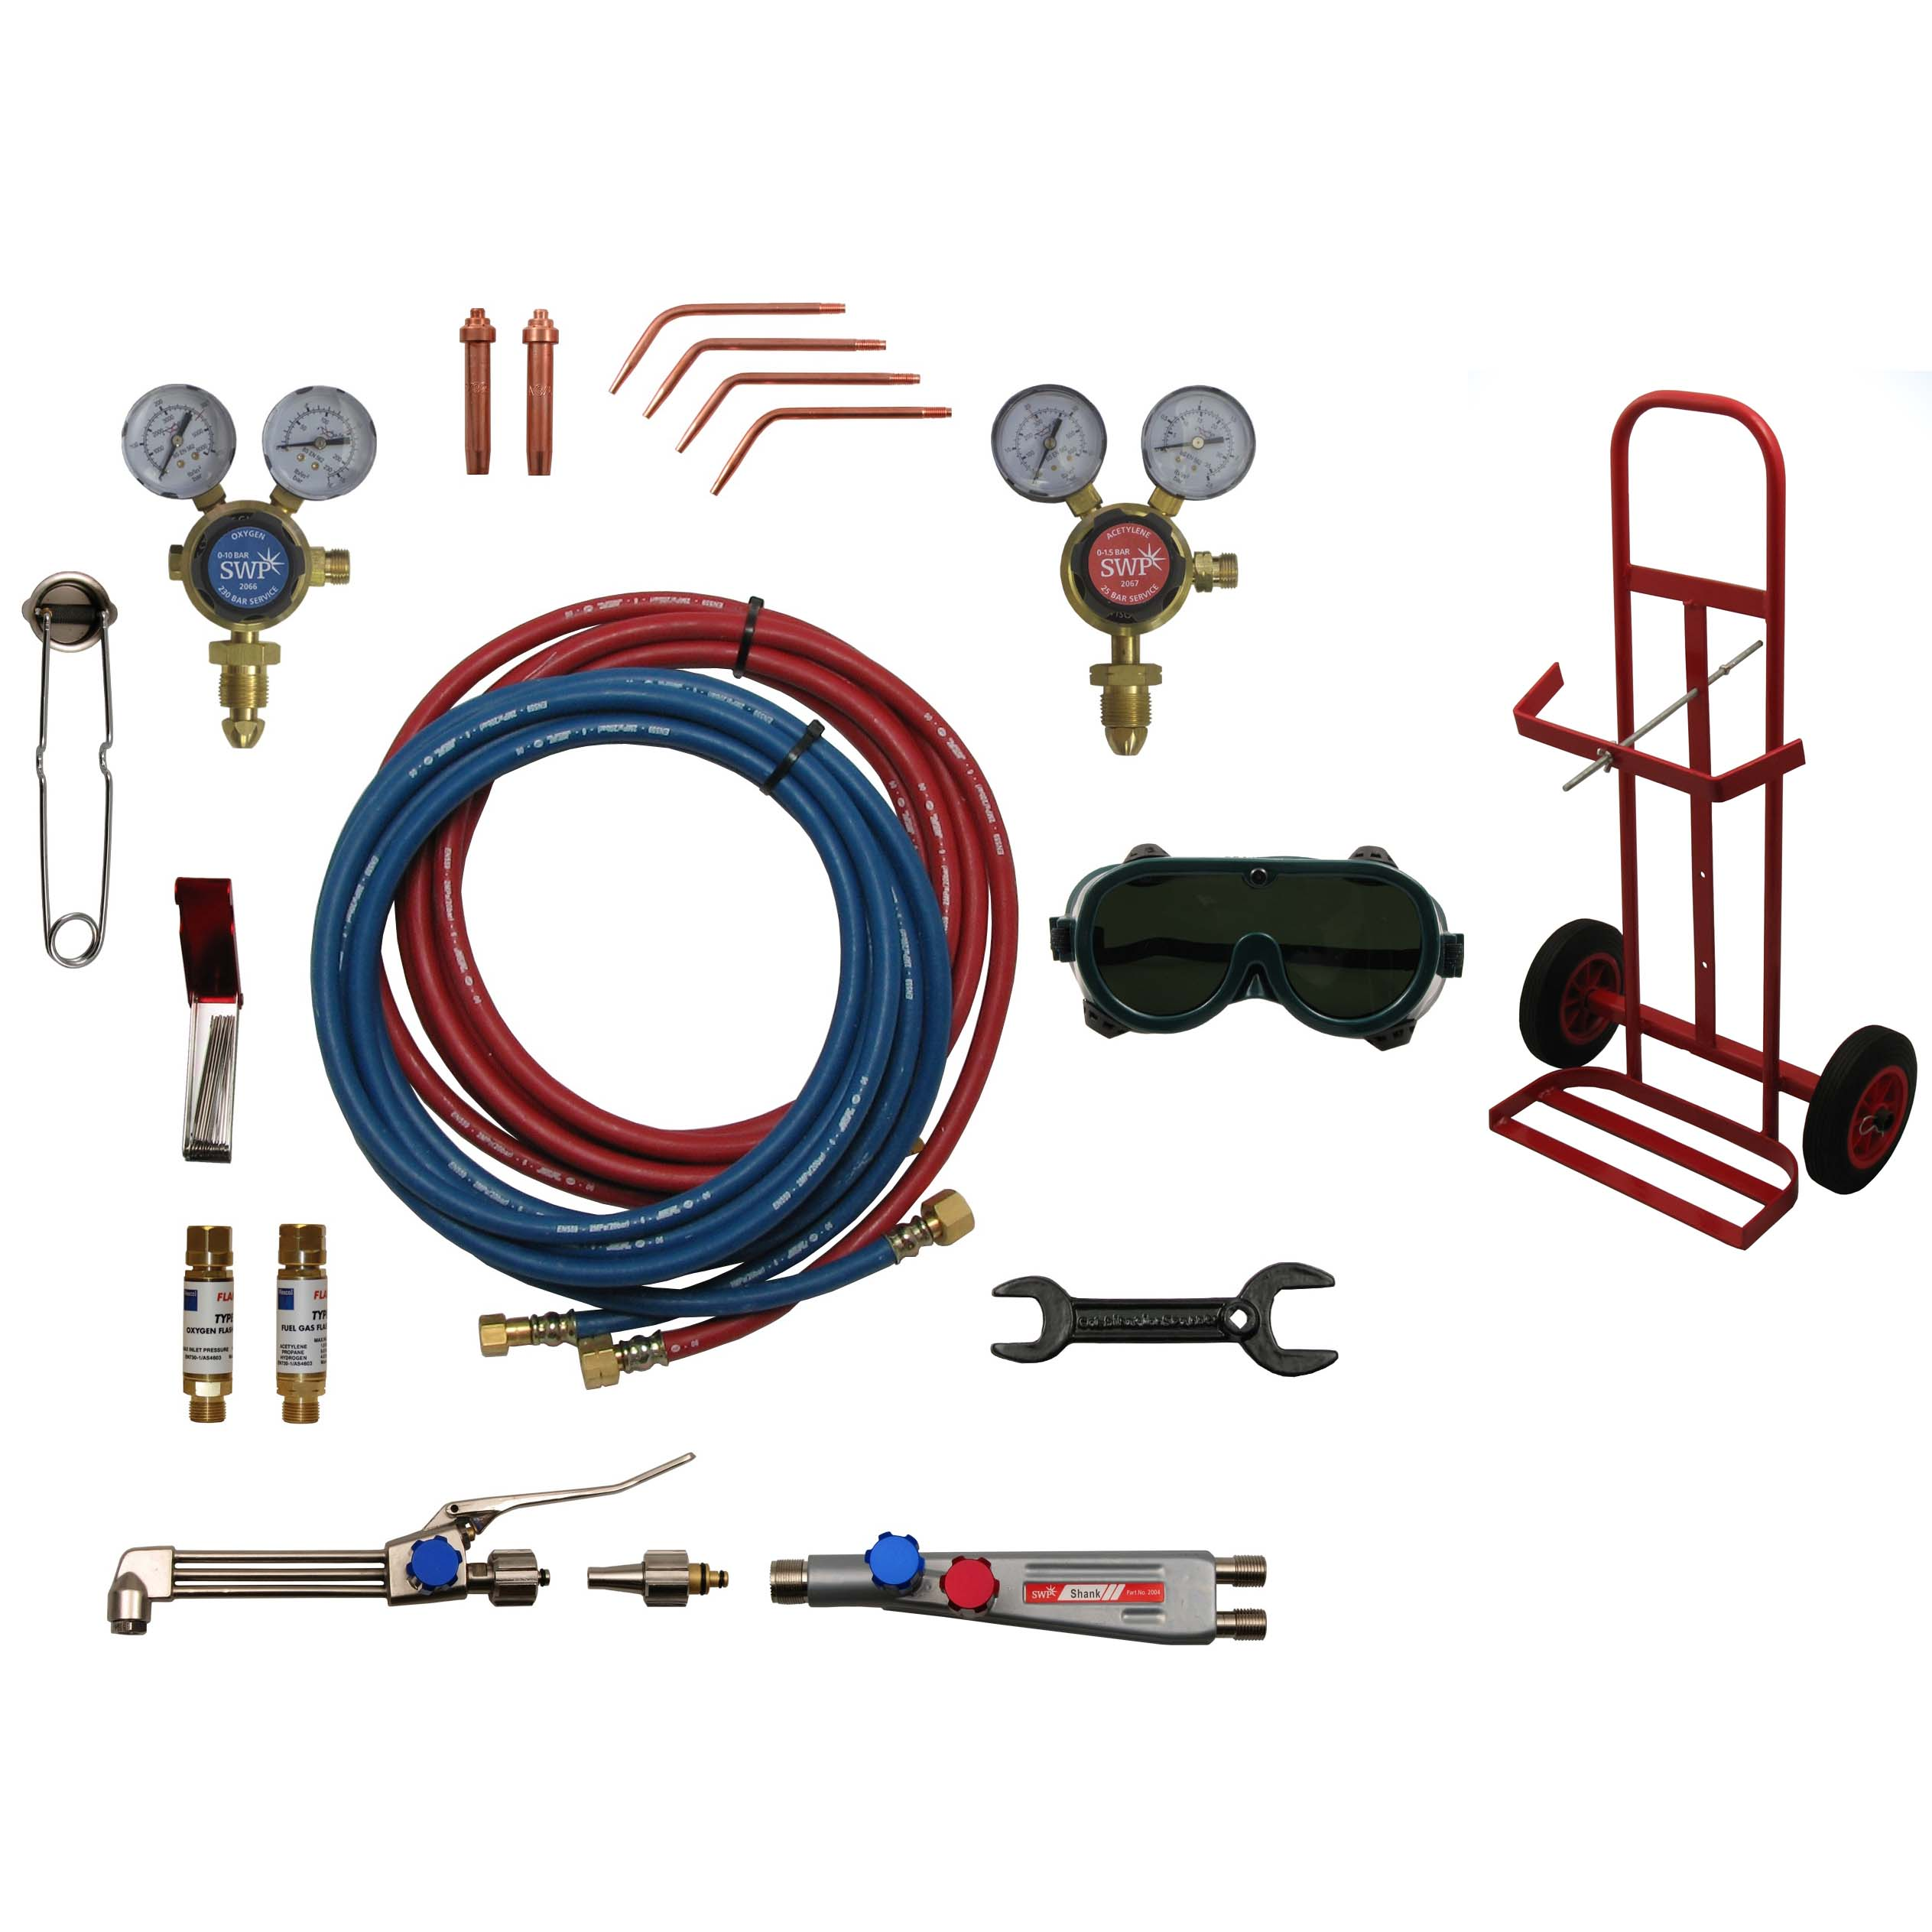 Jasa Pembuatan Website Welding and Cutting Equipment